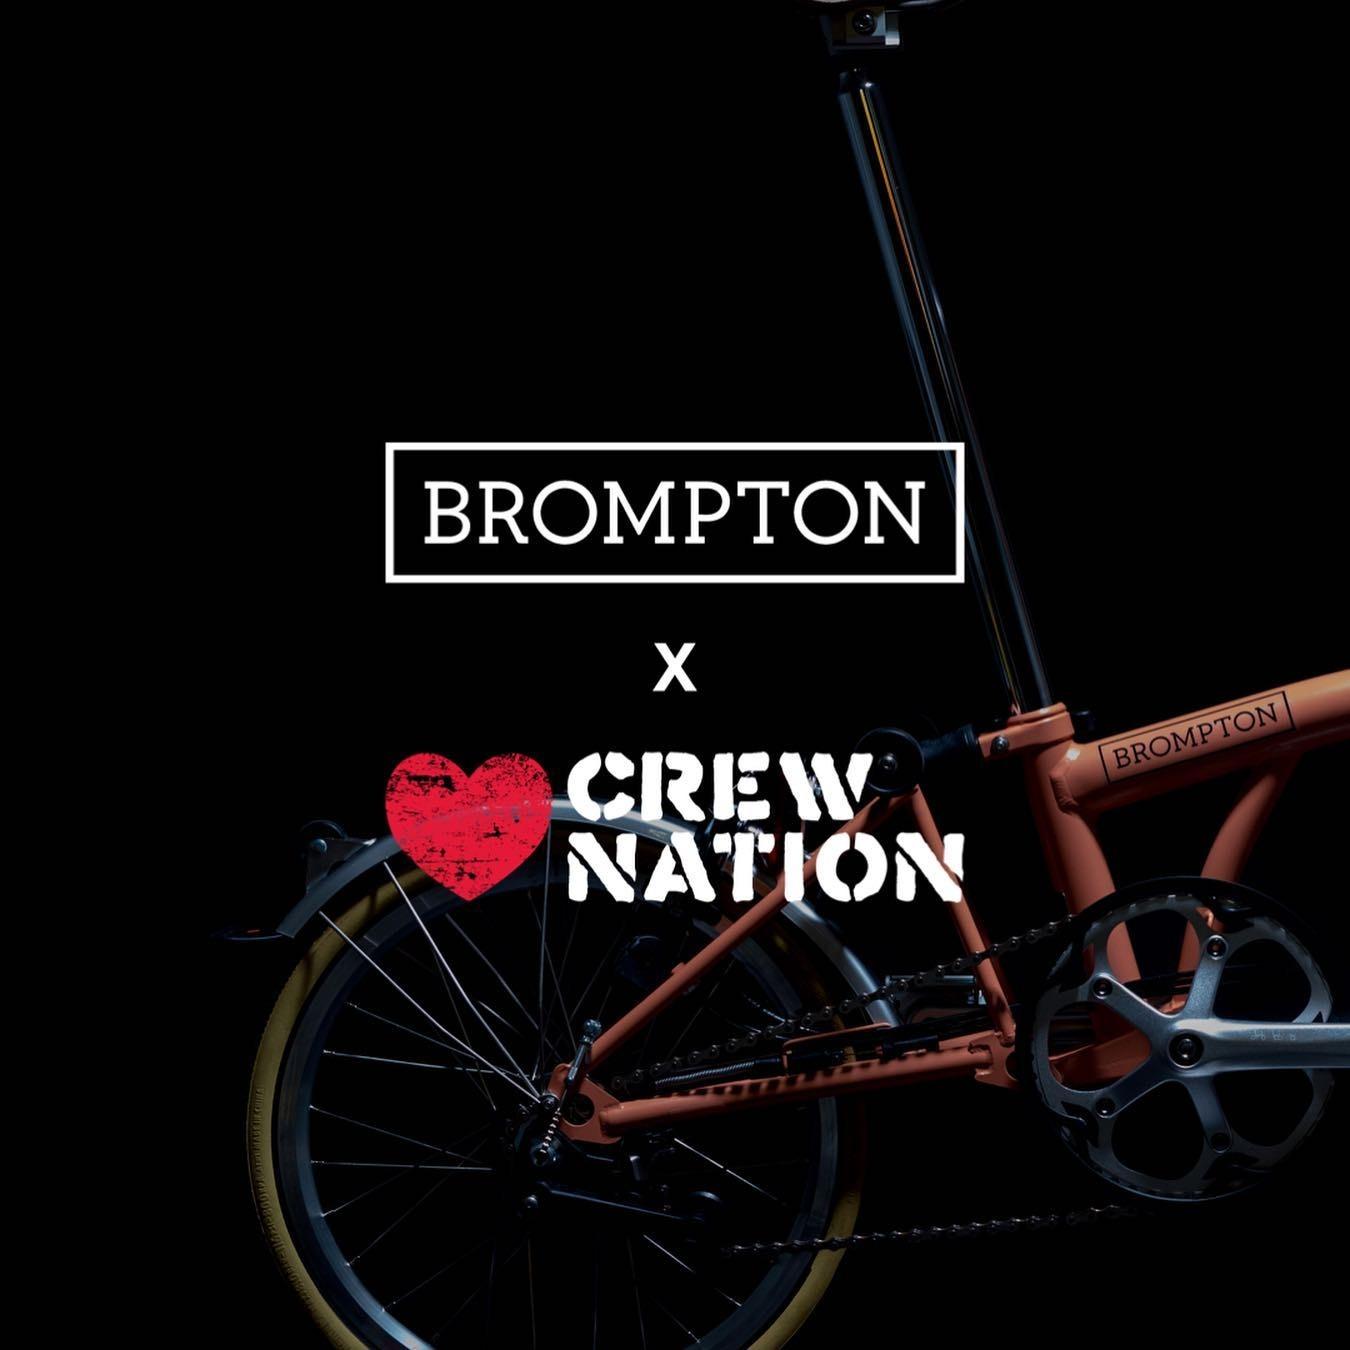 @khruangbin Bin Bin Bike by Brompton Bike x Crew Nation auction Link Thumbnail | Linktree